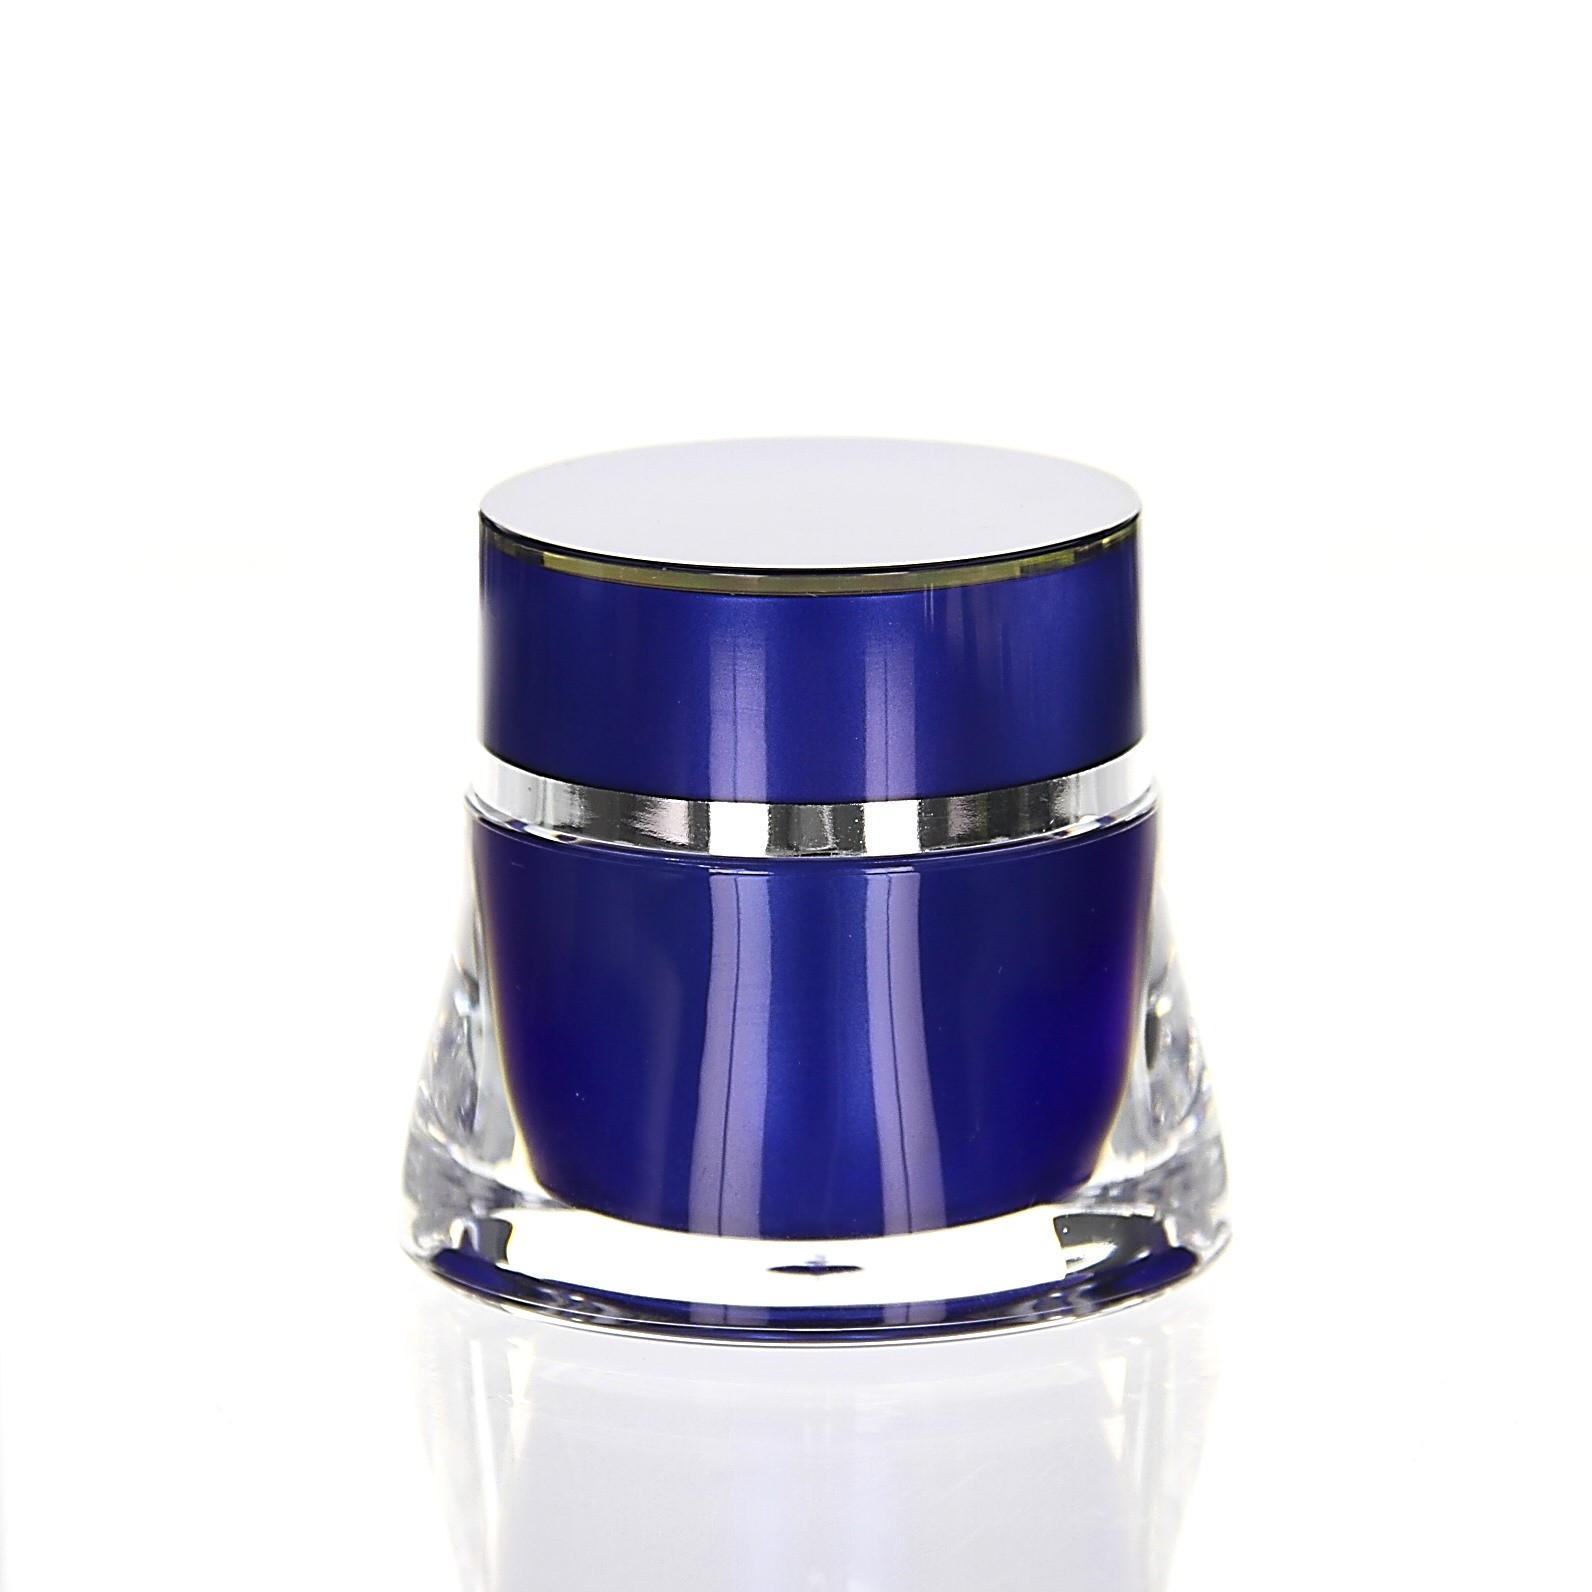 Jet 15ml Blue Jars Acrylic Stock Goods Pot Cream Kosmetik More Views